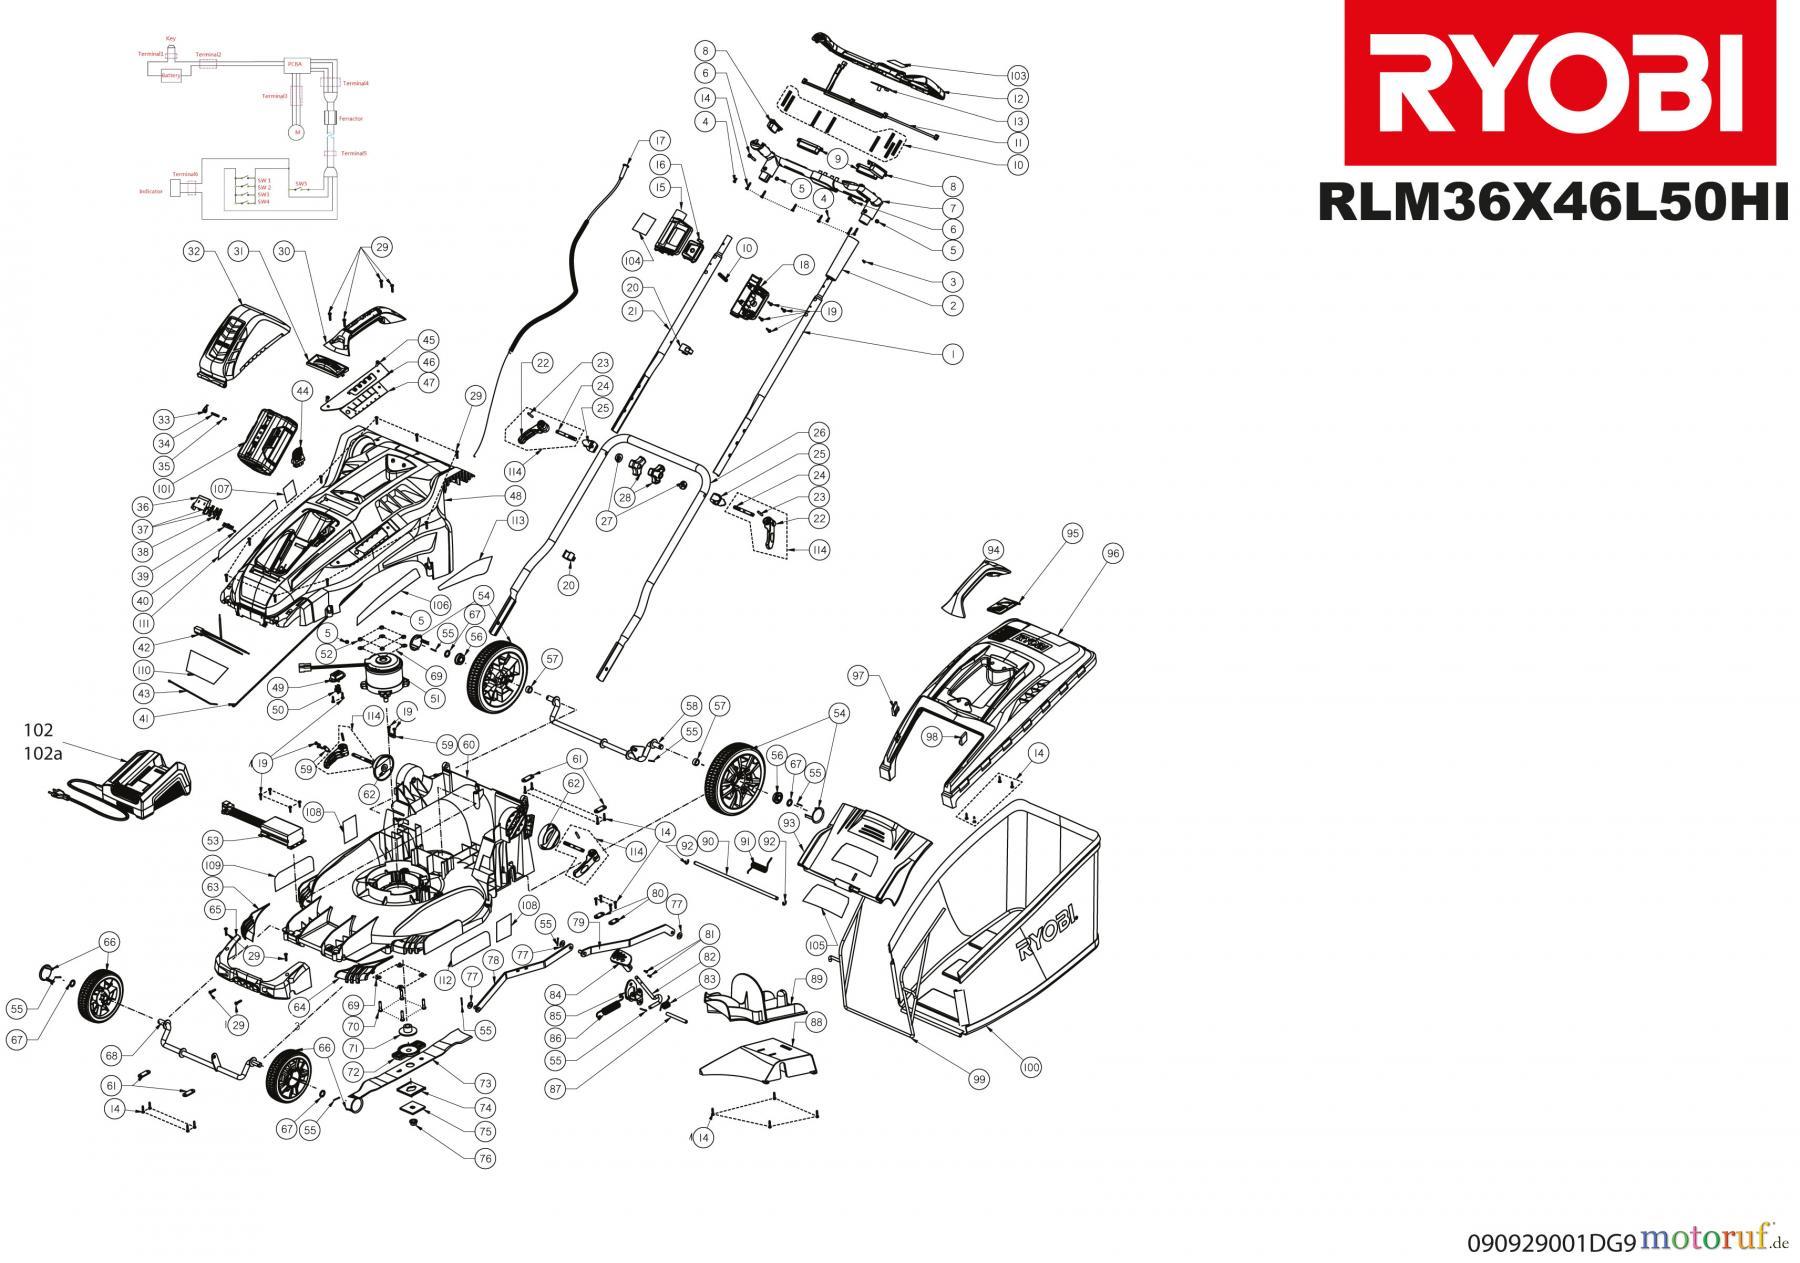 Ryobi Rasenmäher Akku RLM36X46L50HI Spareparts